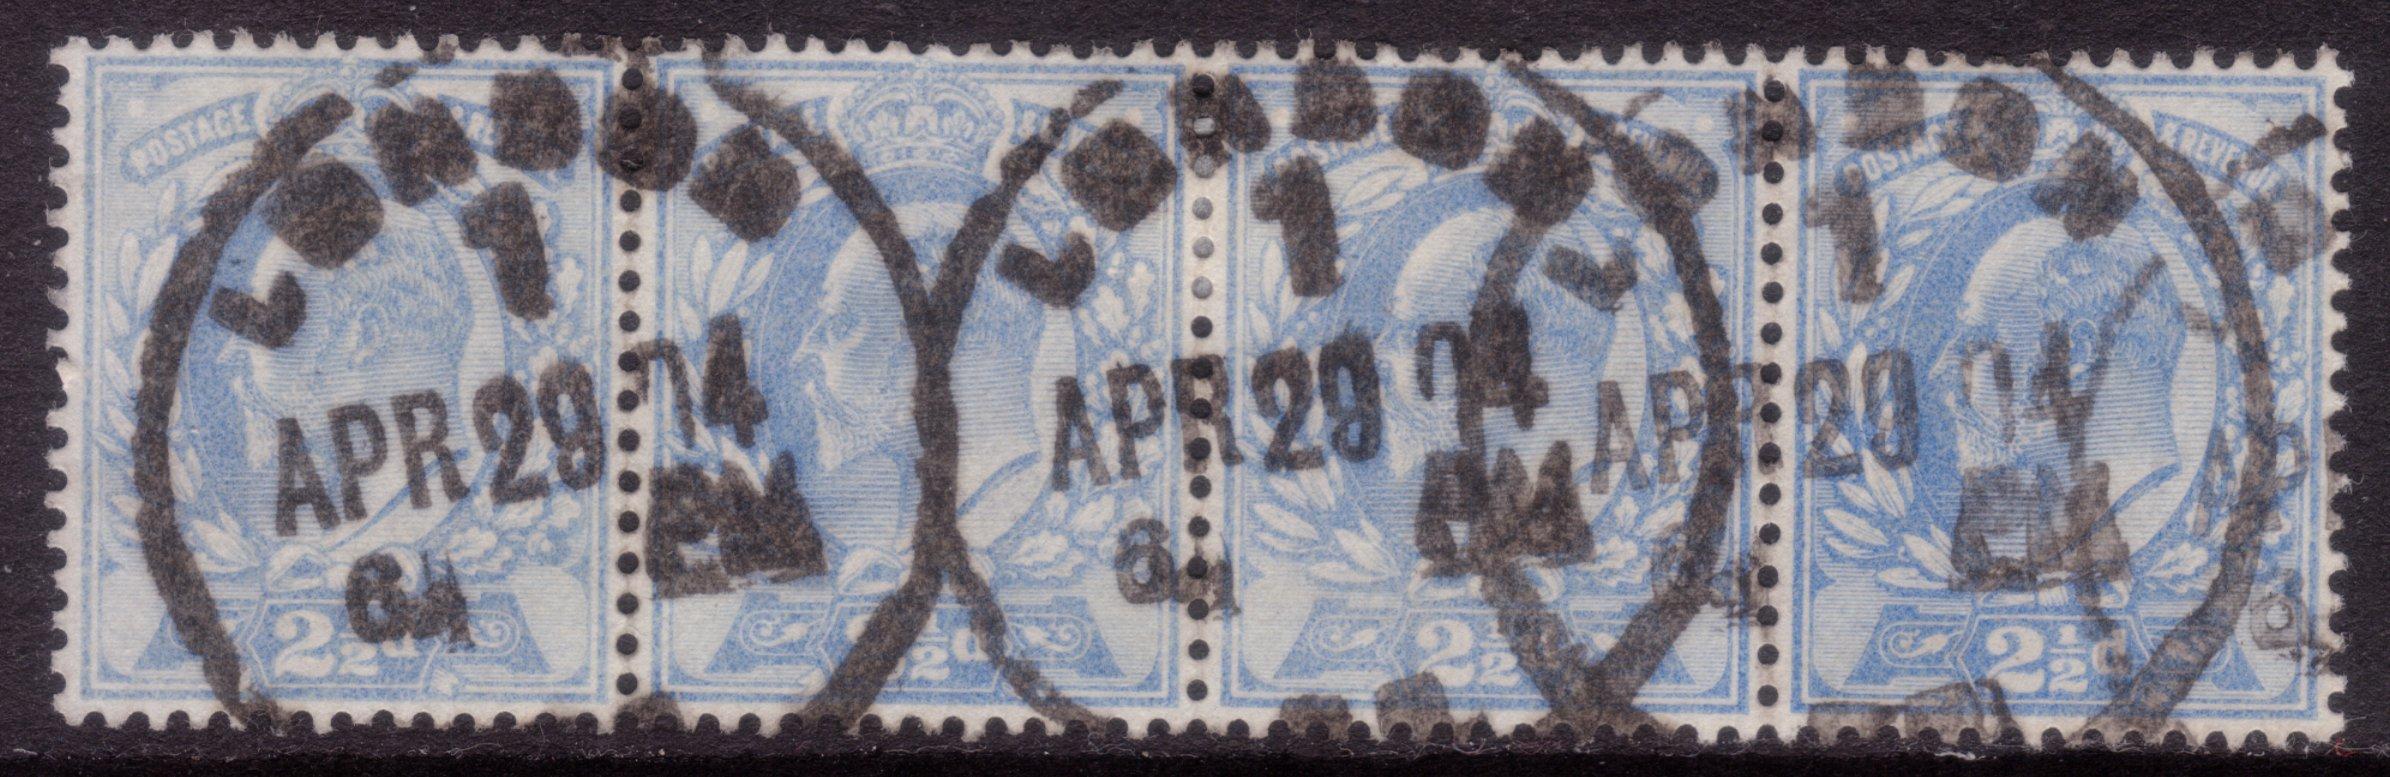 1902 2½d Pale Ultramarine Scarce Used 'London 1' Skeletons Strip of Four